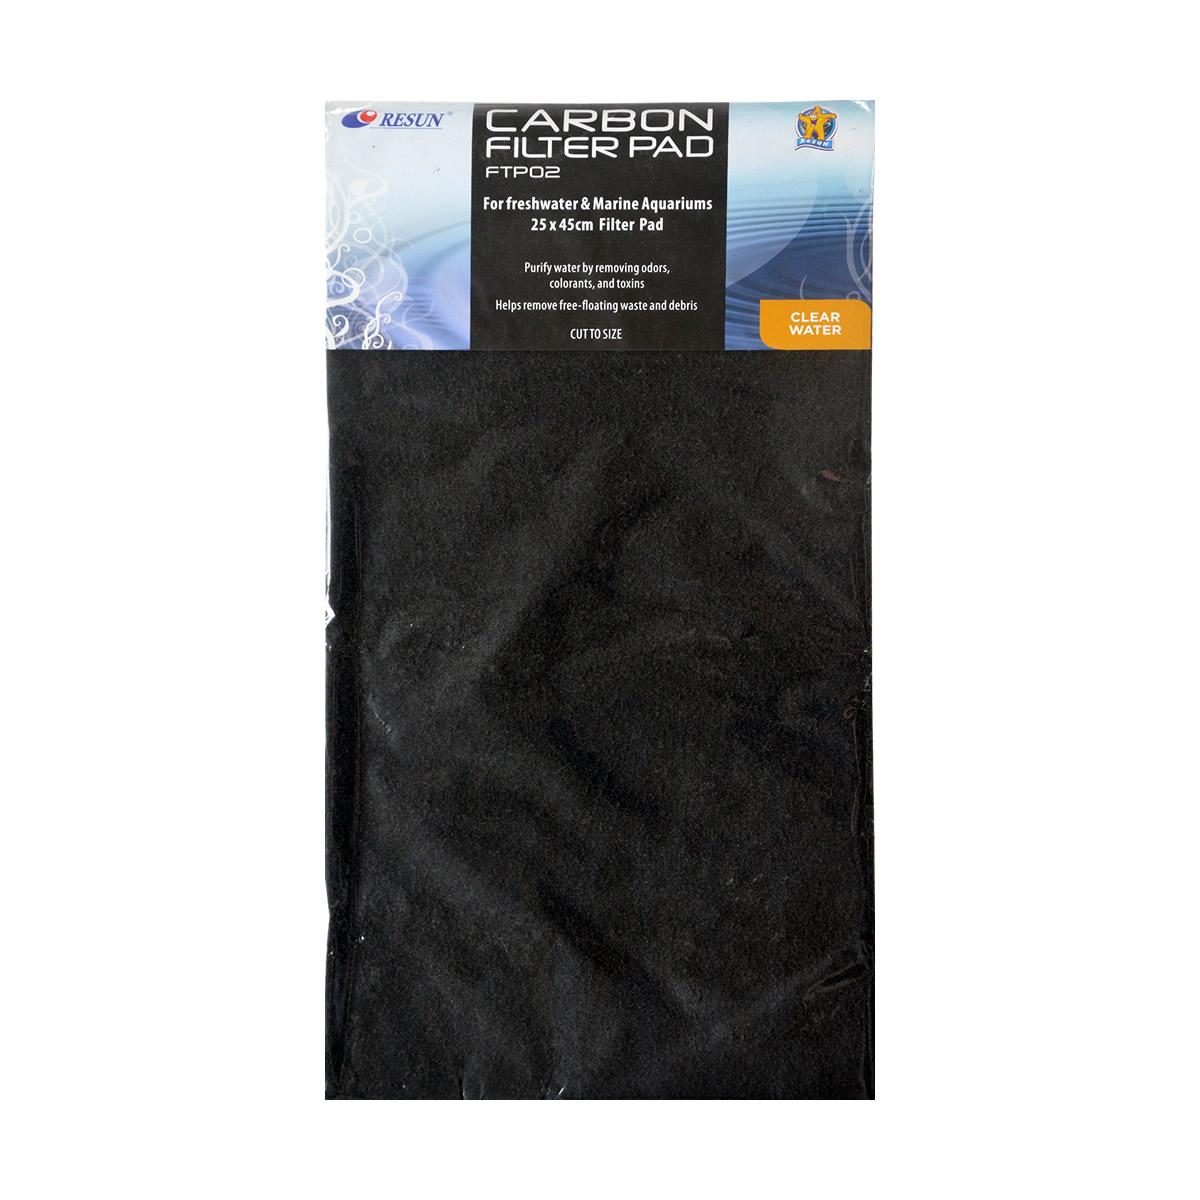 ReSun FTP02 Carbon Filter Pad 10x18 inch